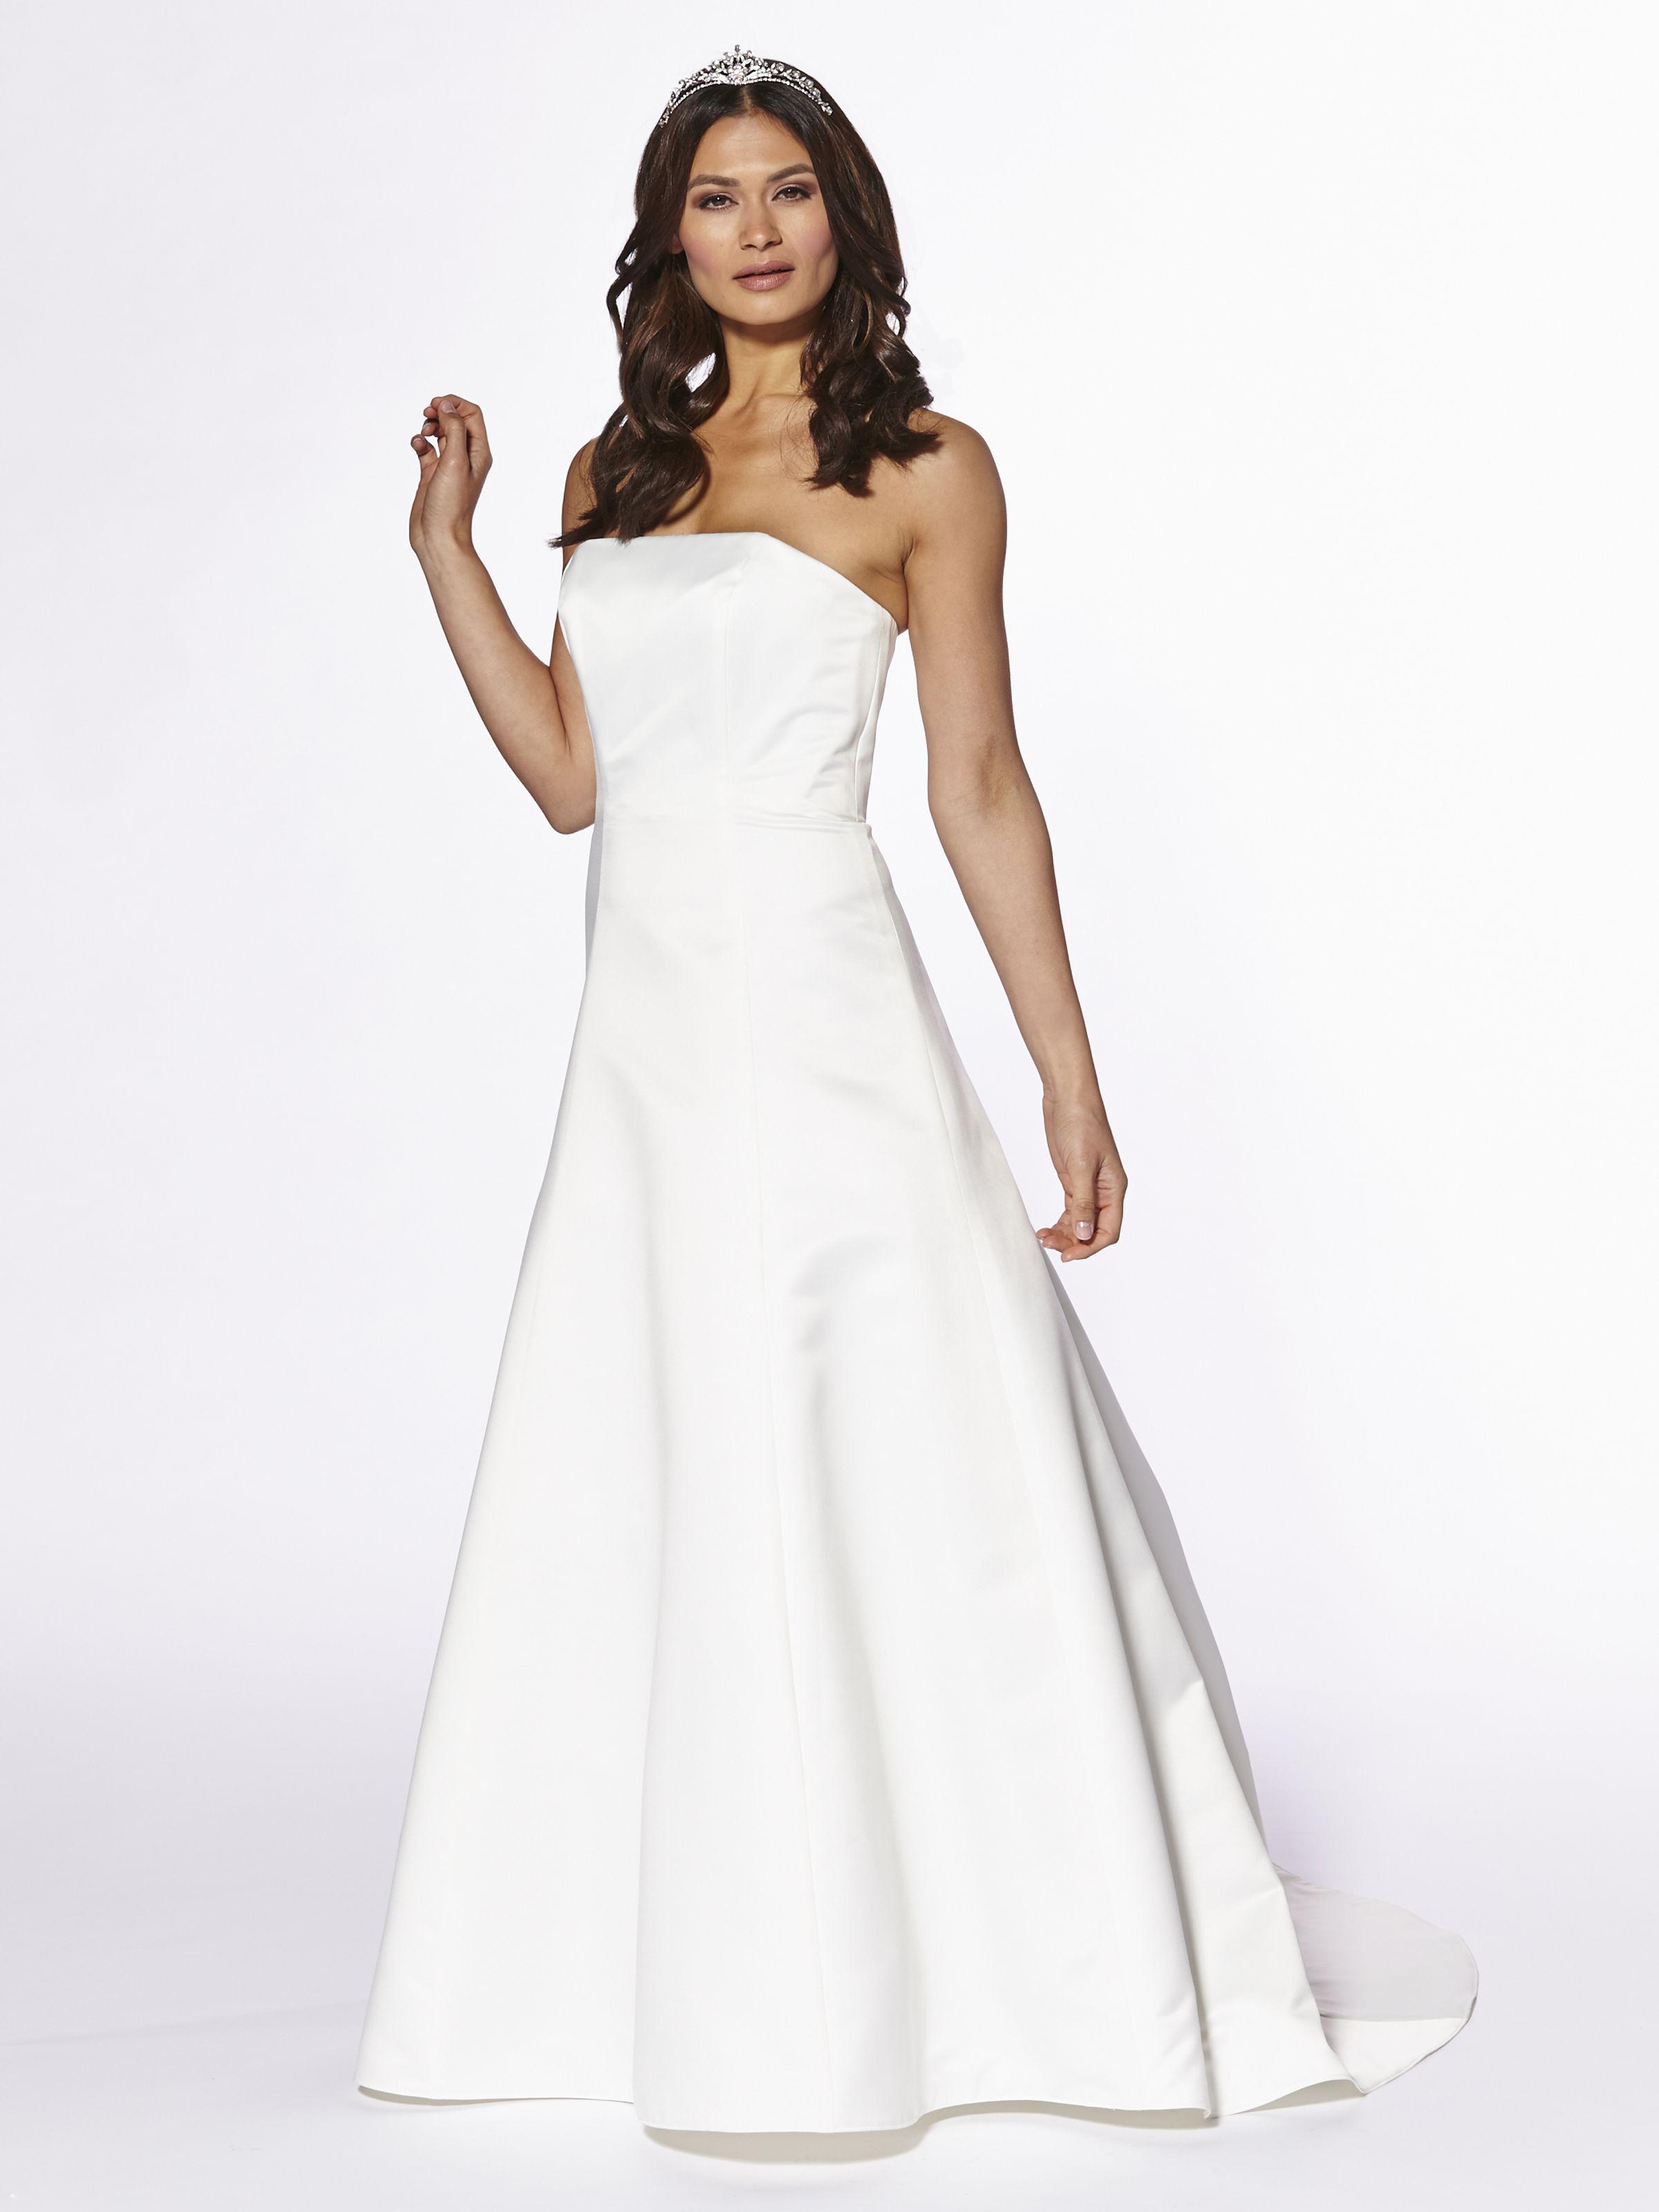 Gabs satin base dress my traditional wedding pinterest satin